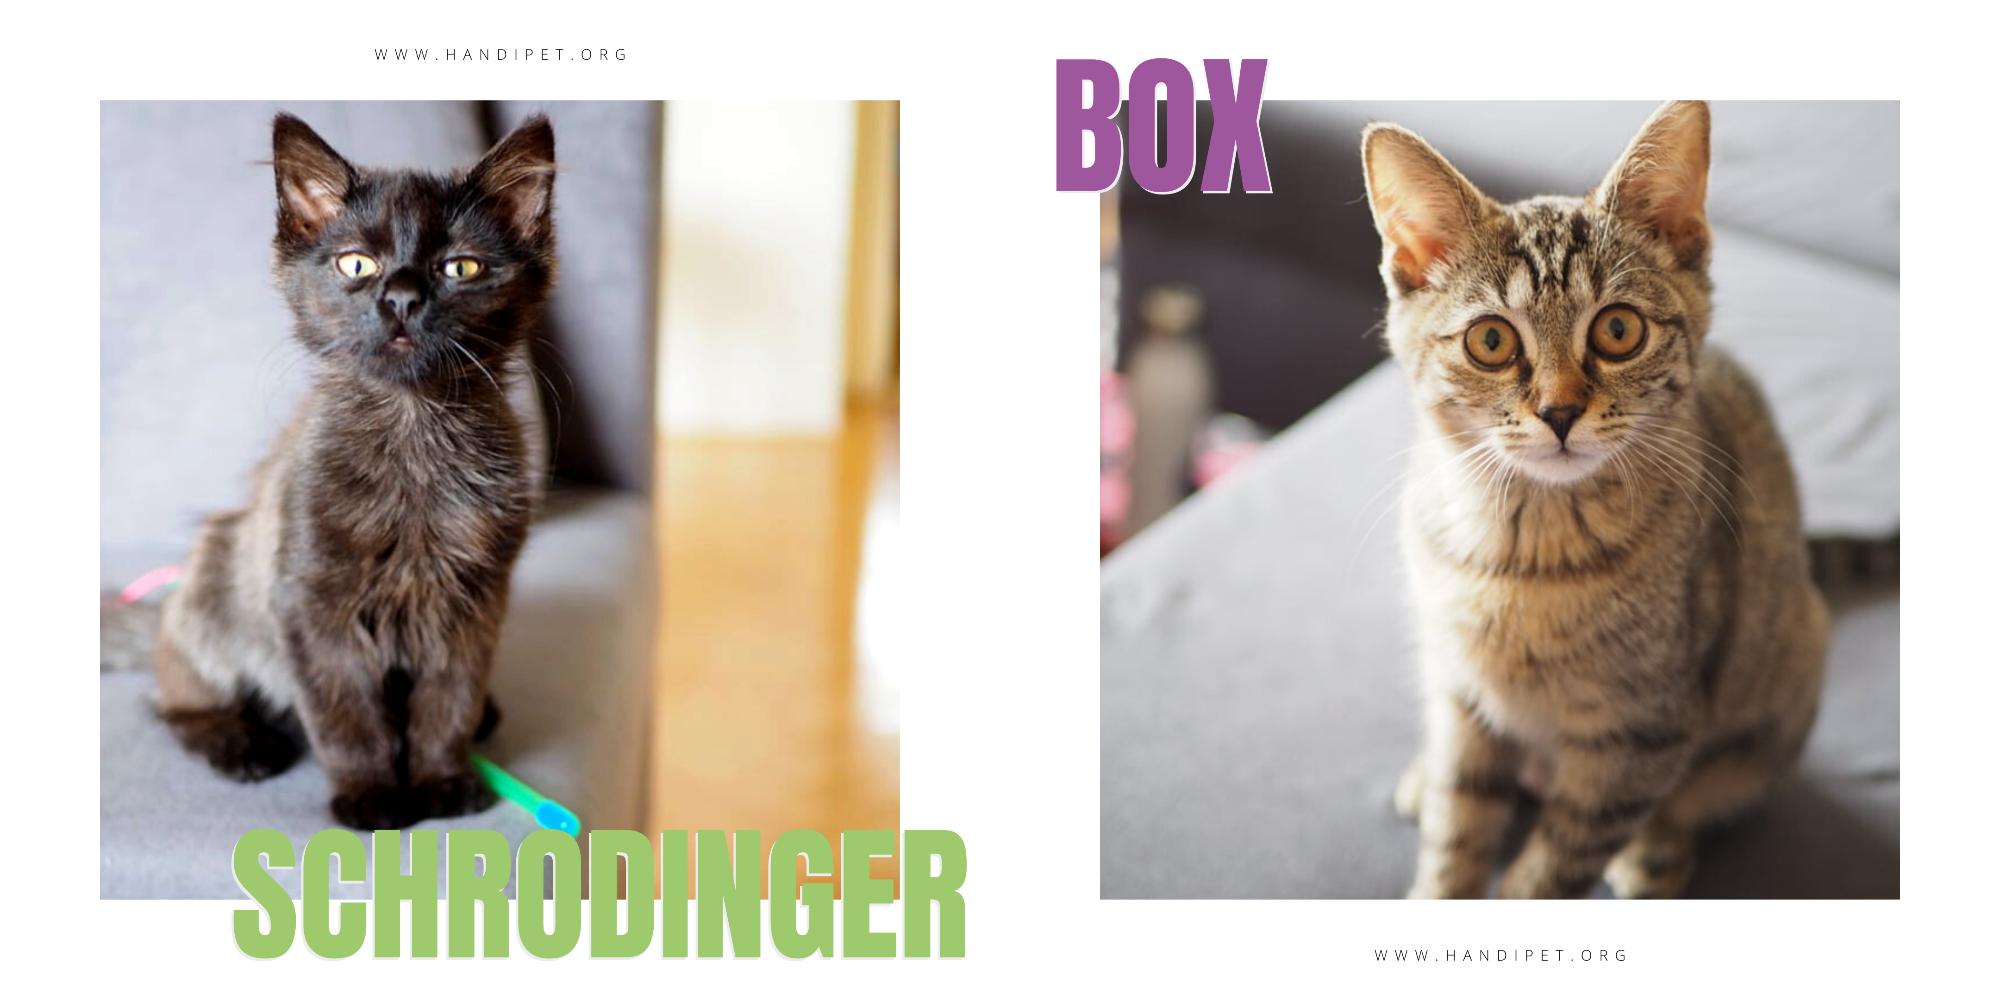 Schrodinger a Box